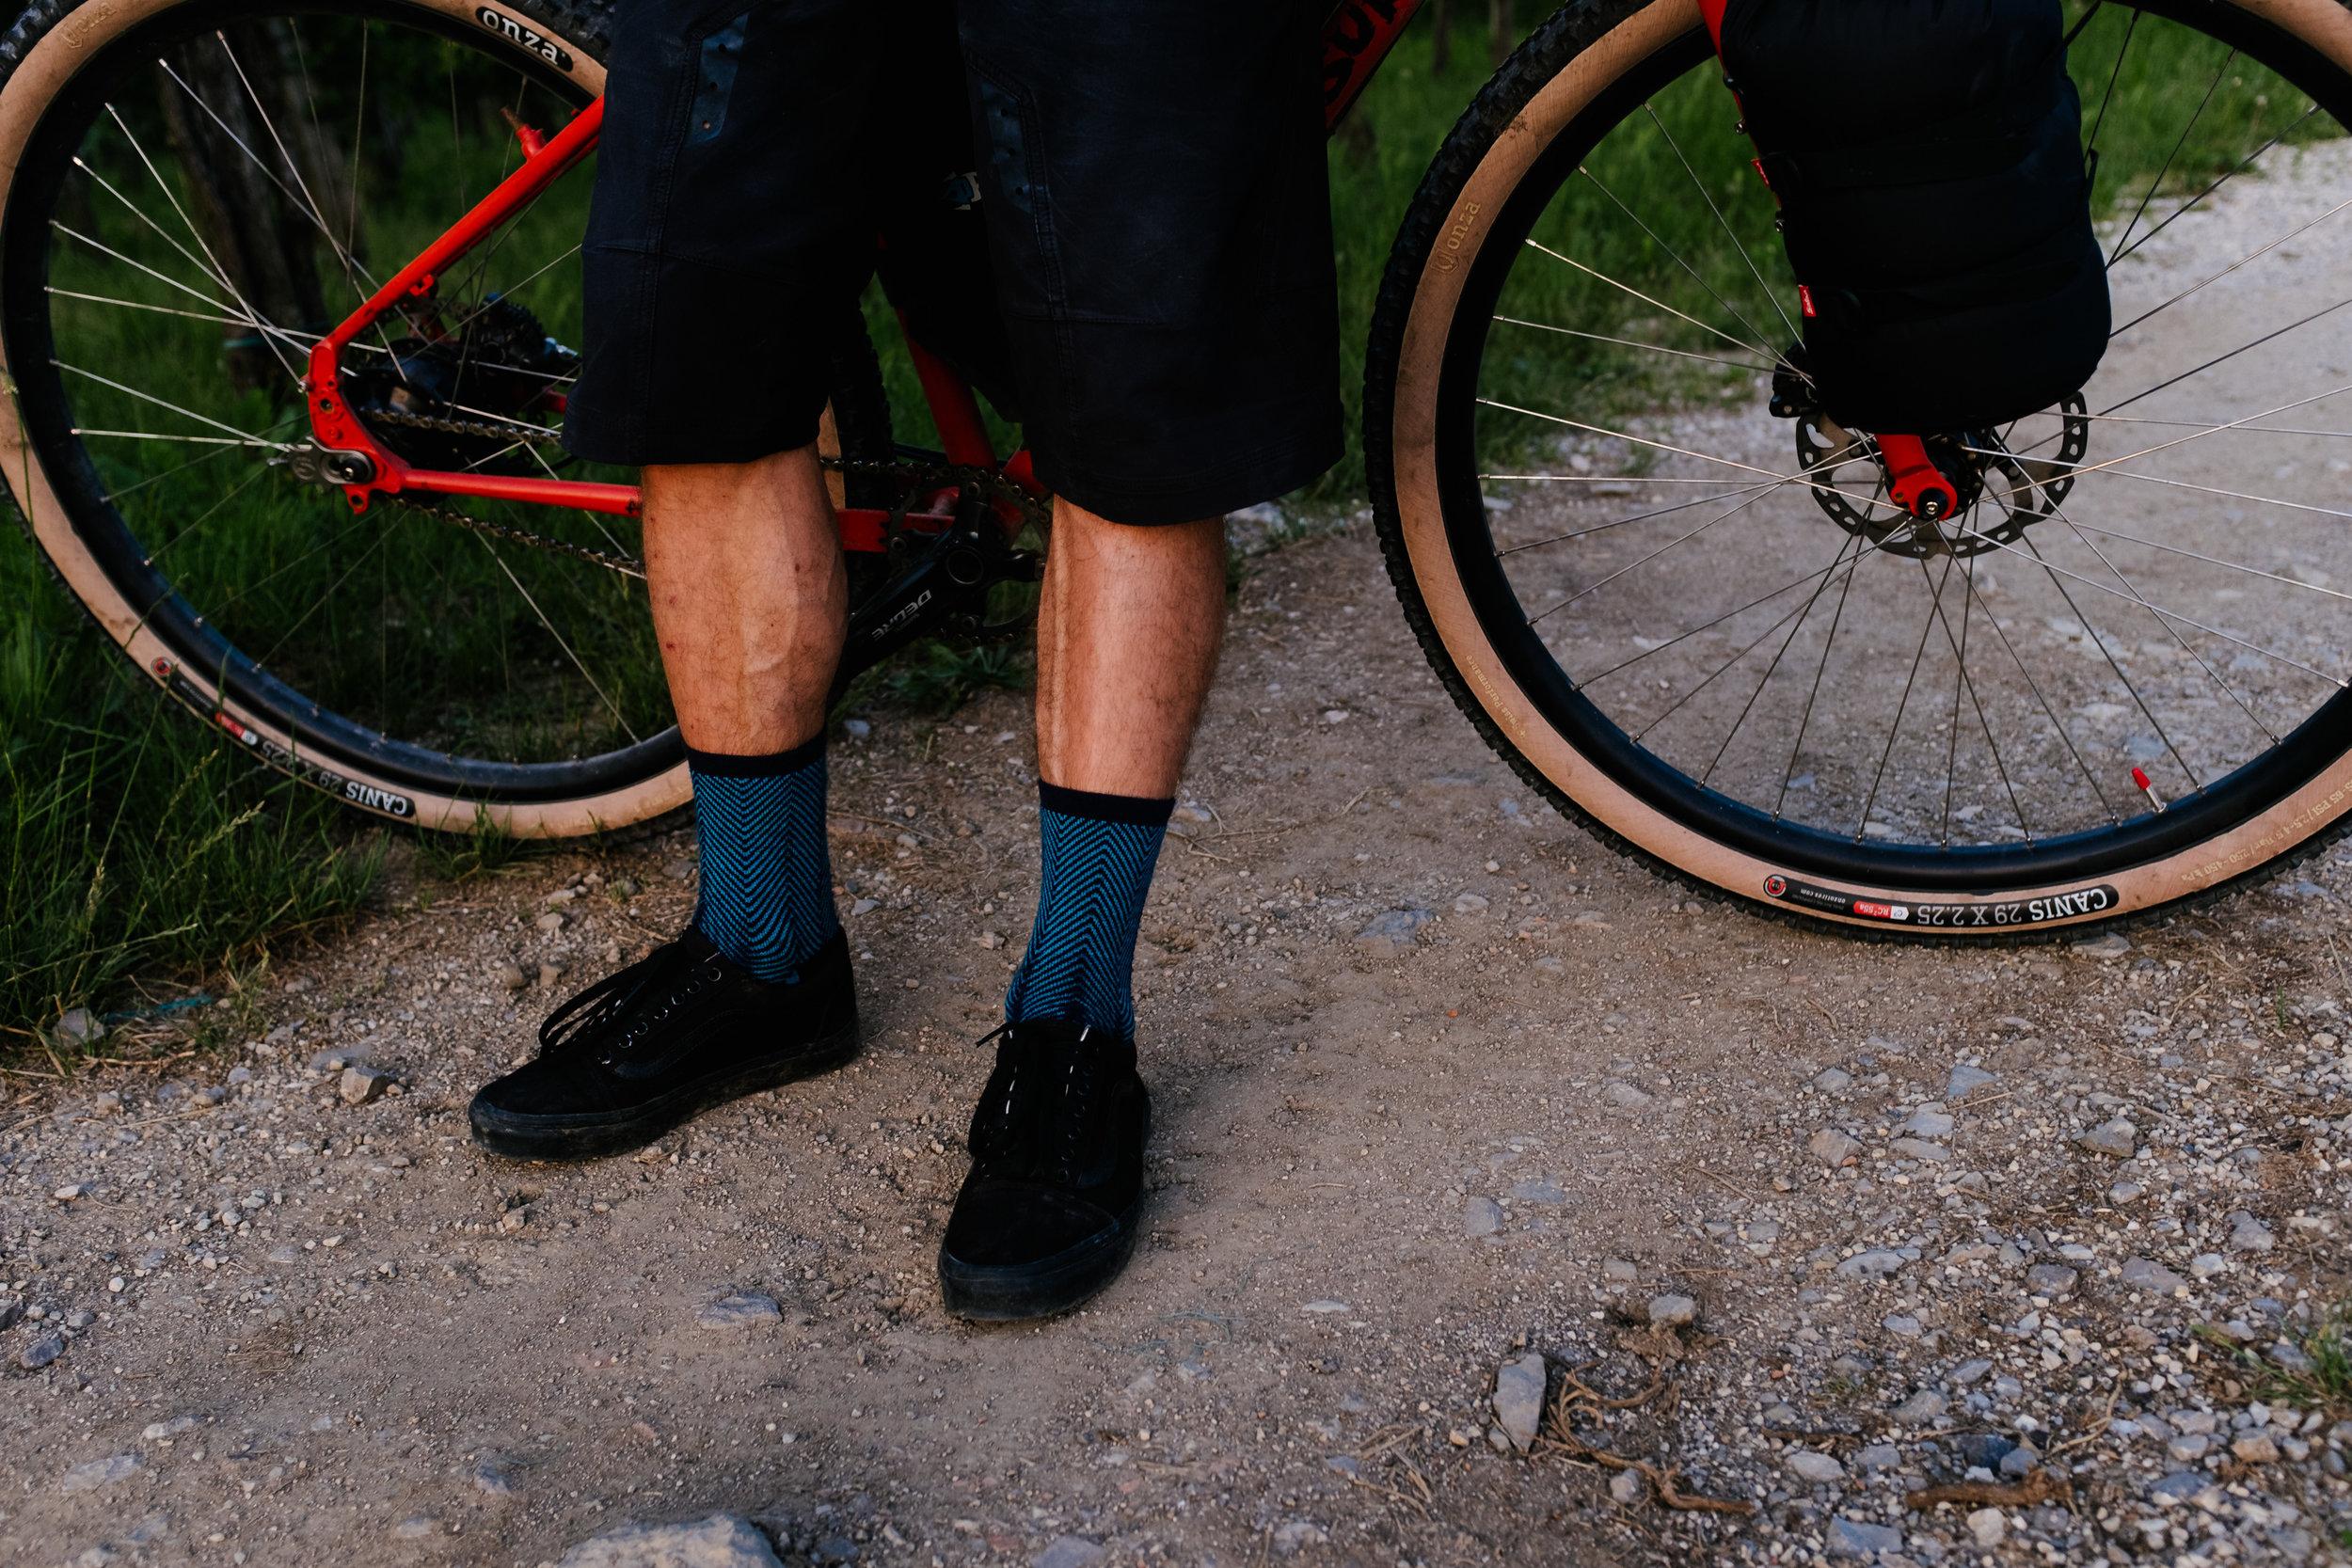 BenReadPhotography_Bikepacking-85.jpg